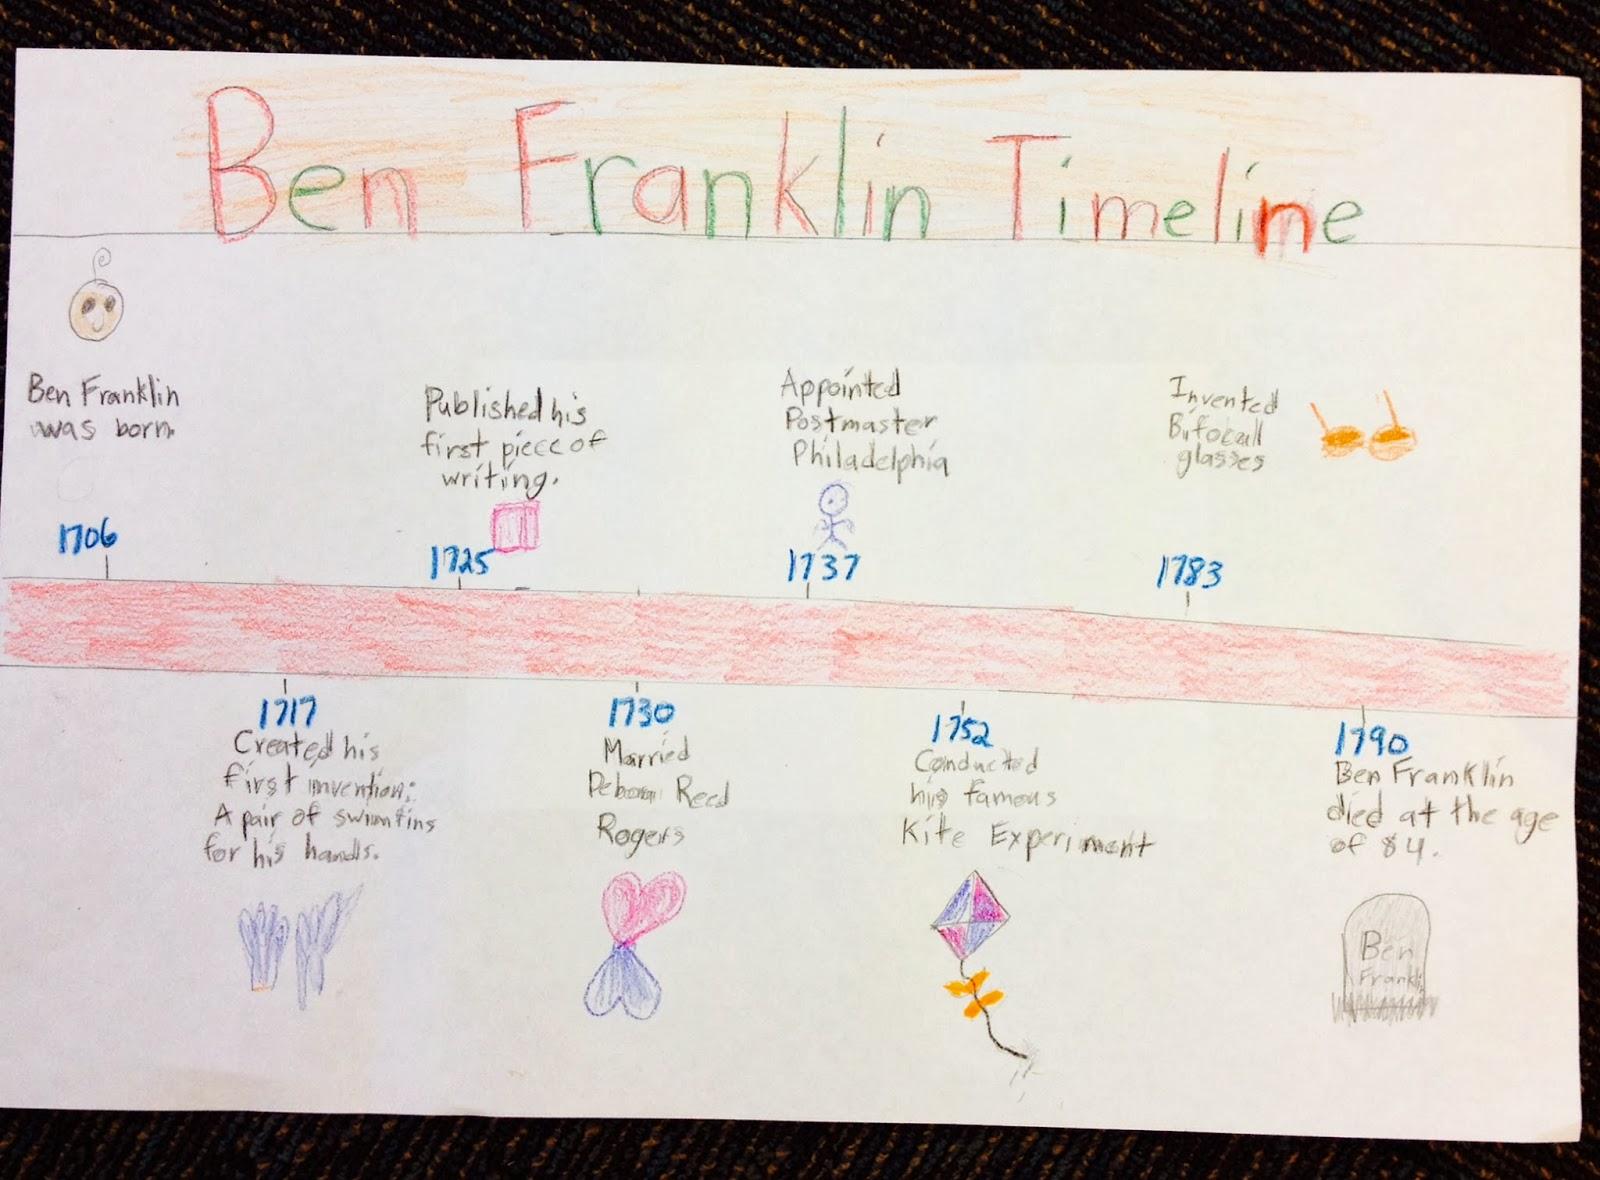 Karen Mensing: Benjamin Franklin Timeline